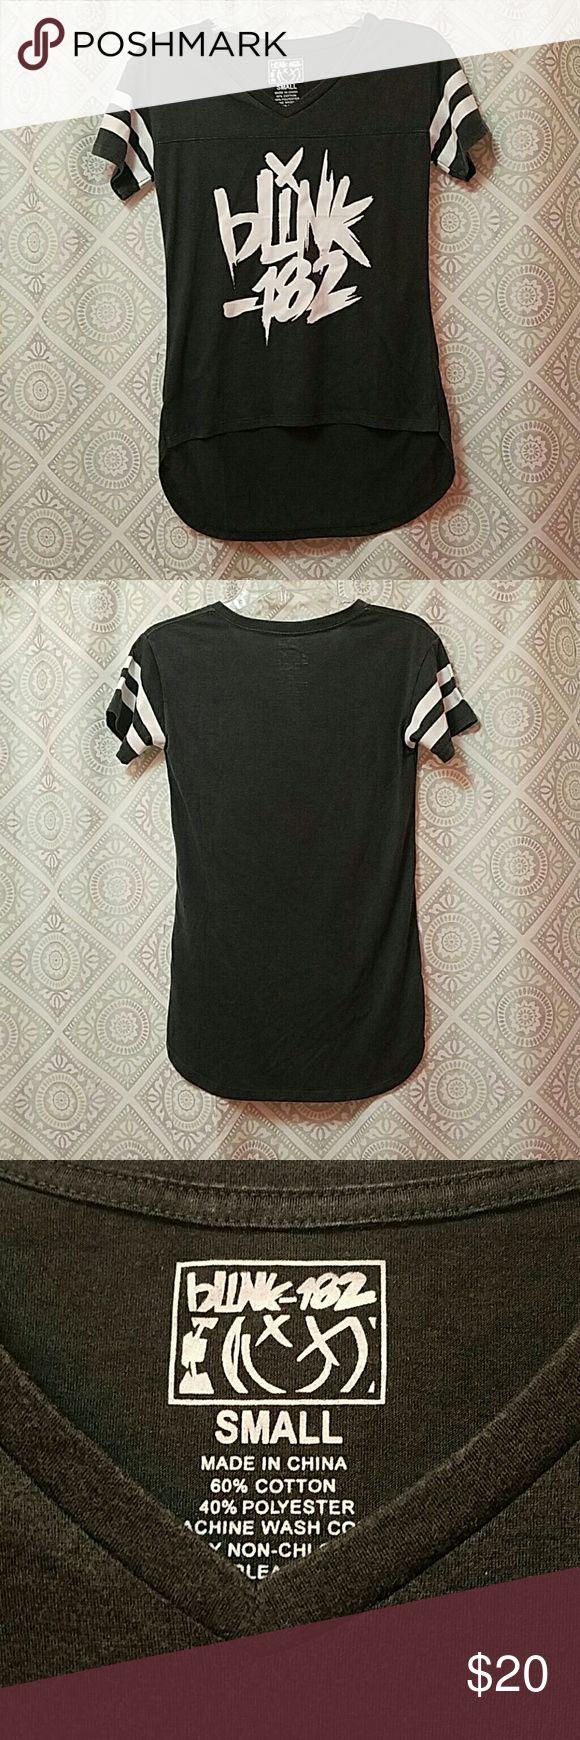 Blink 182 shirt Authentic Blink 182 concert t-shirt. NWOT Never worn. Tops Tees - Short Sleeve